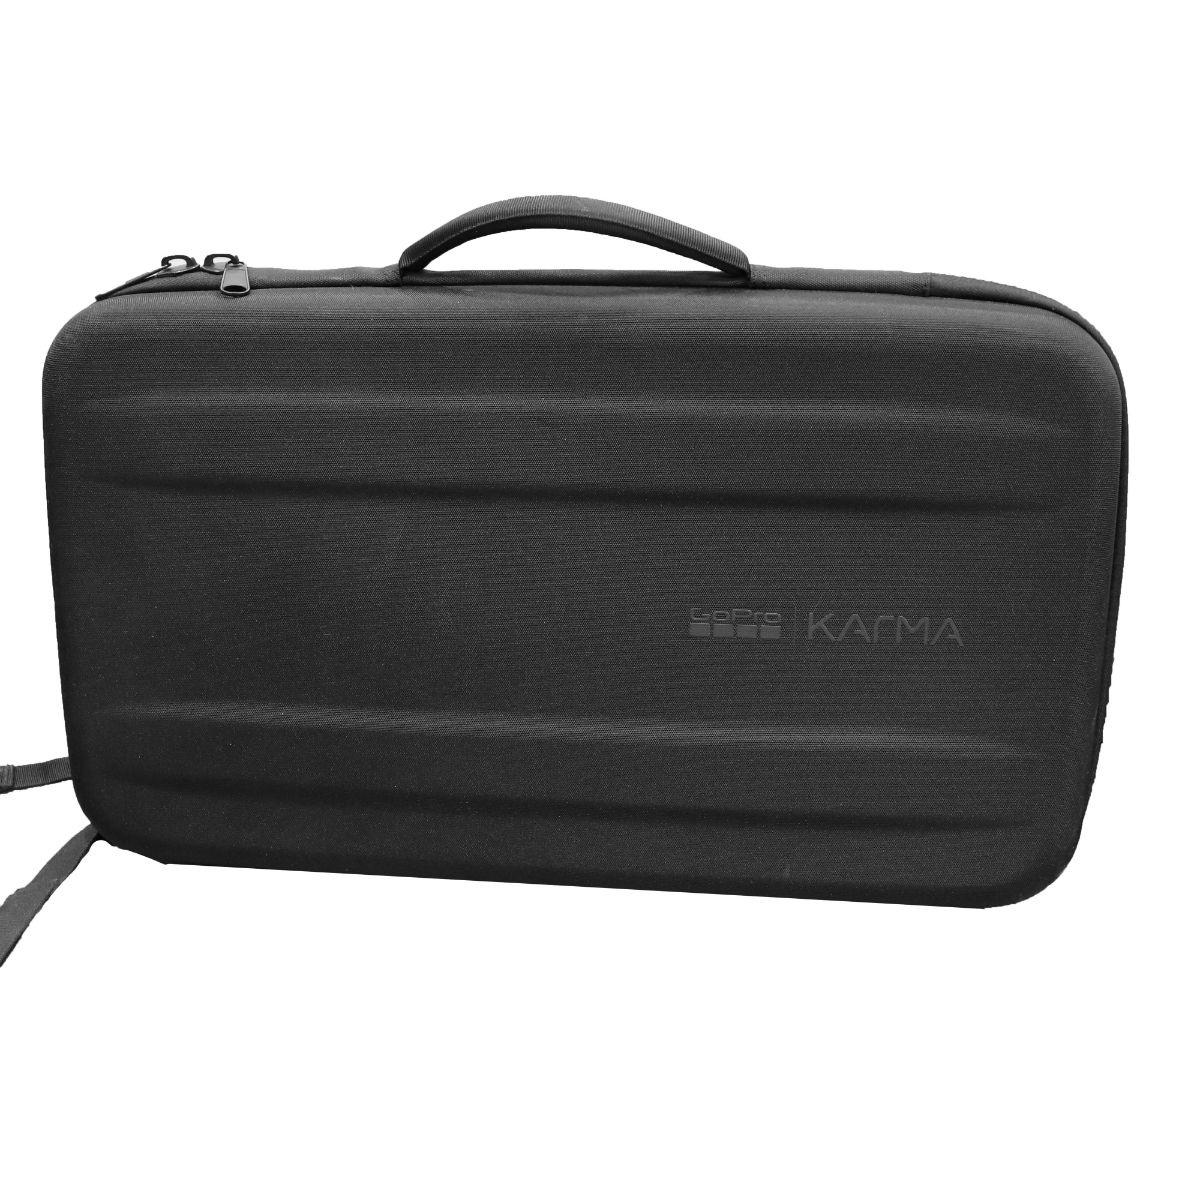 Official GoPro Karma Drone Backpack Case - Black